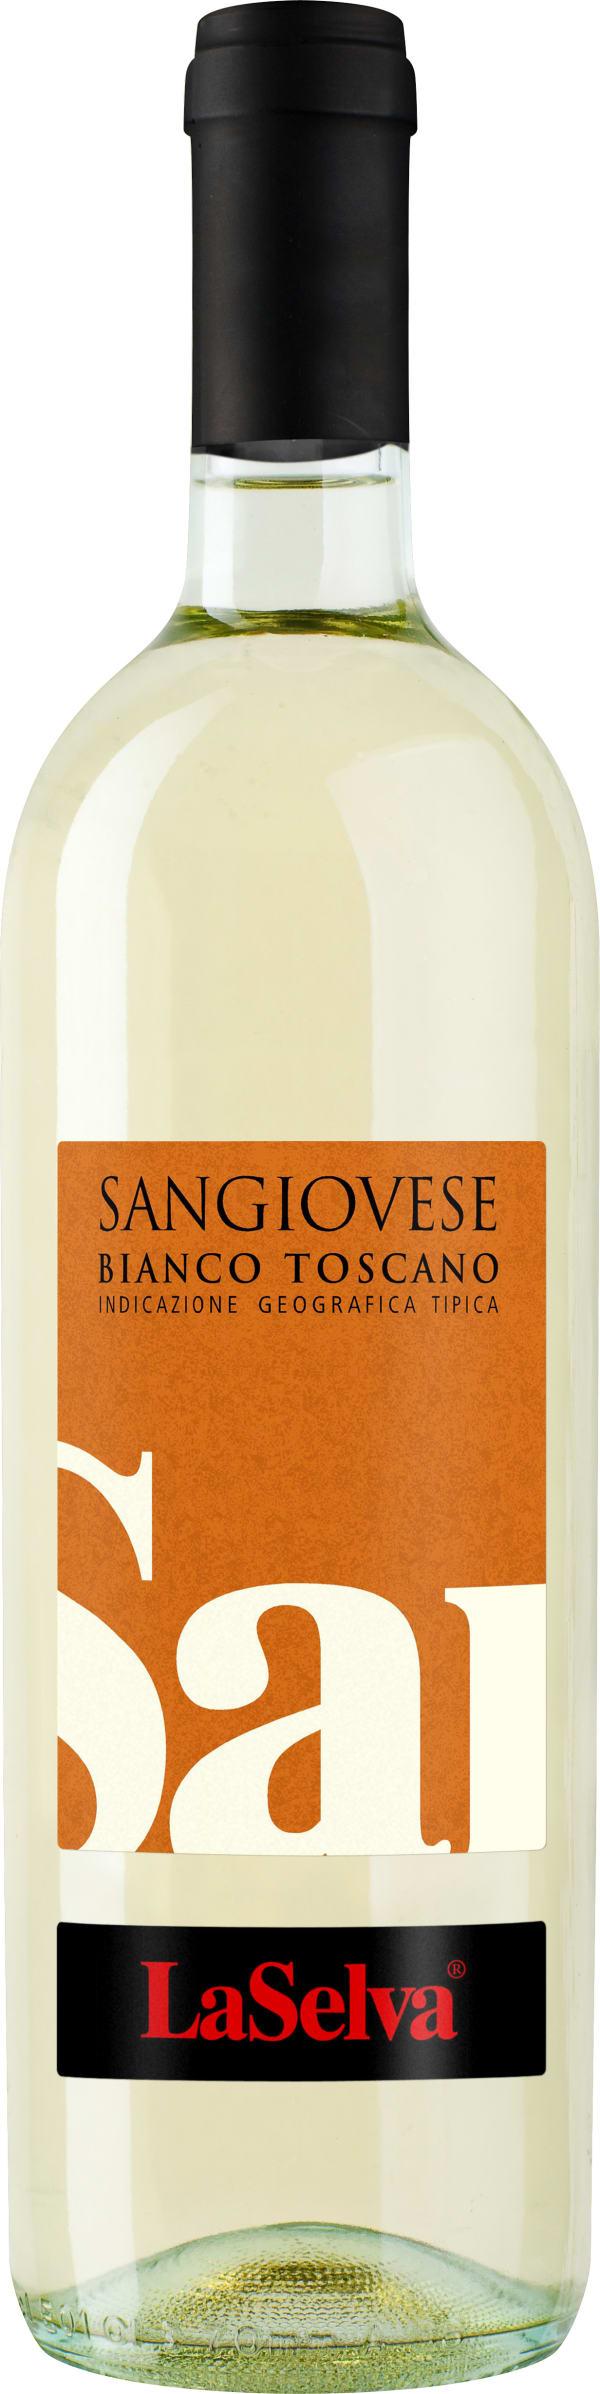 La Selva Sangiovese Bianco 2016